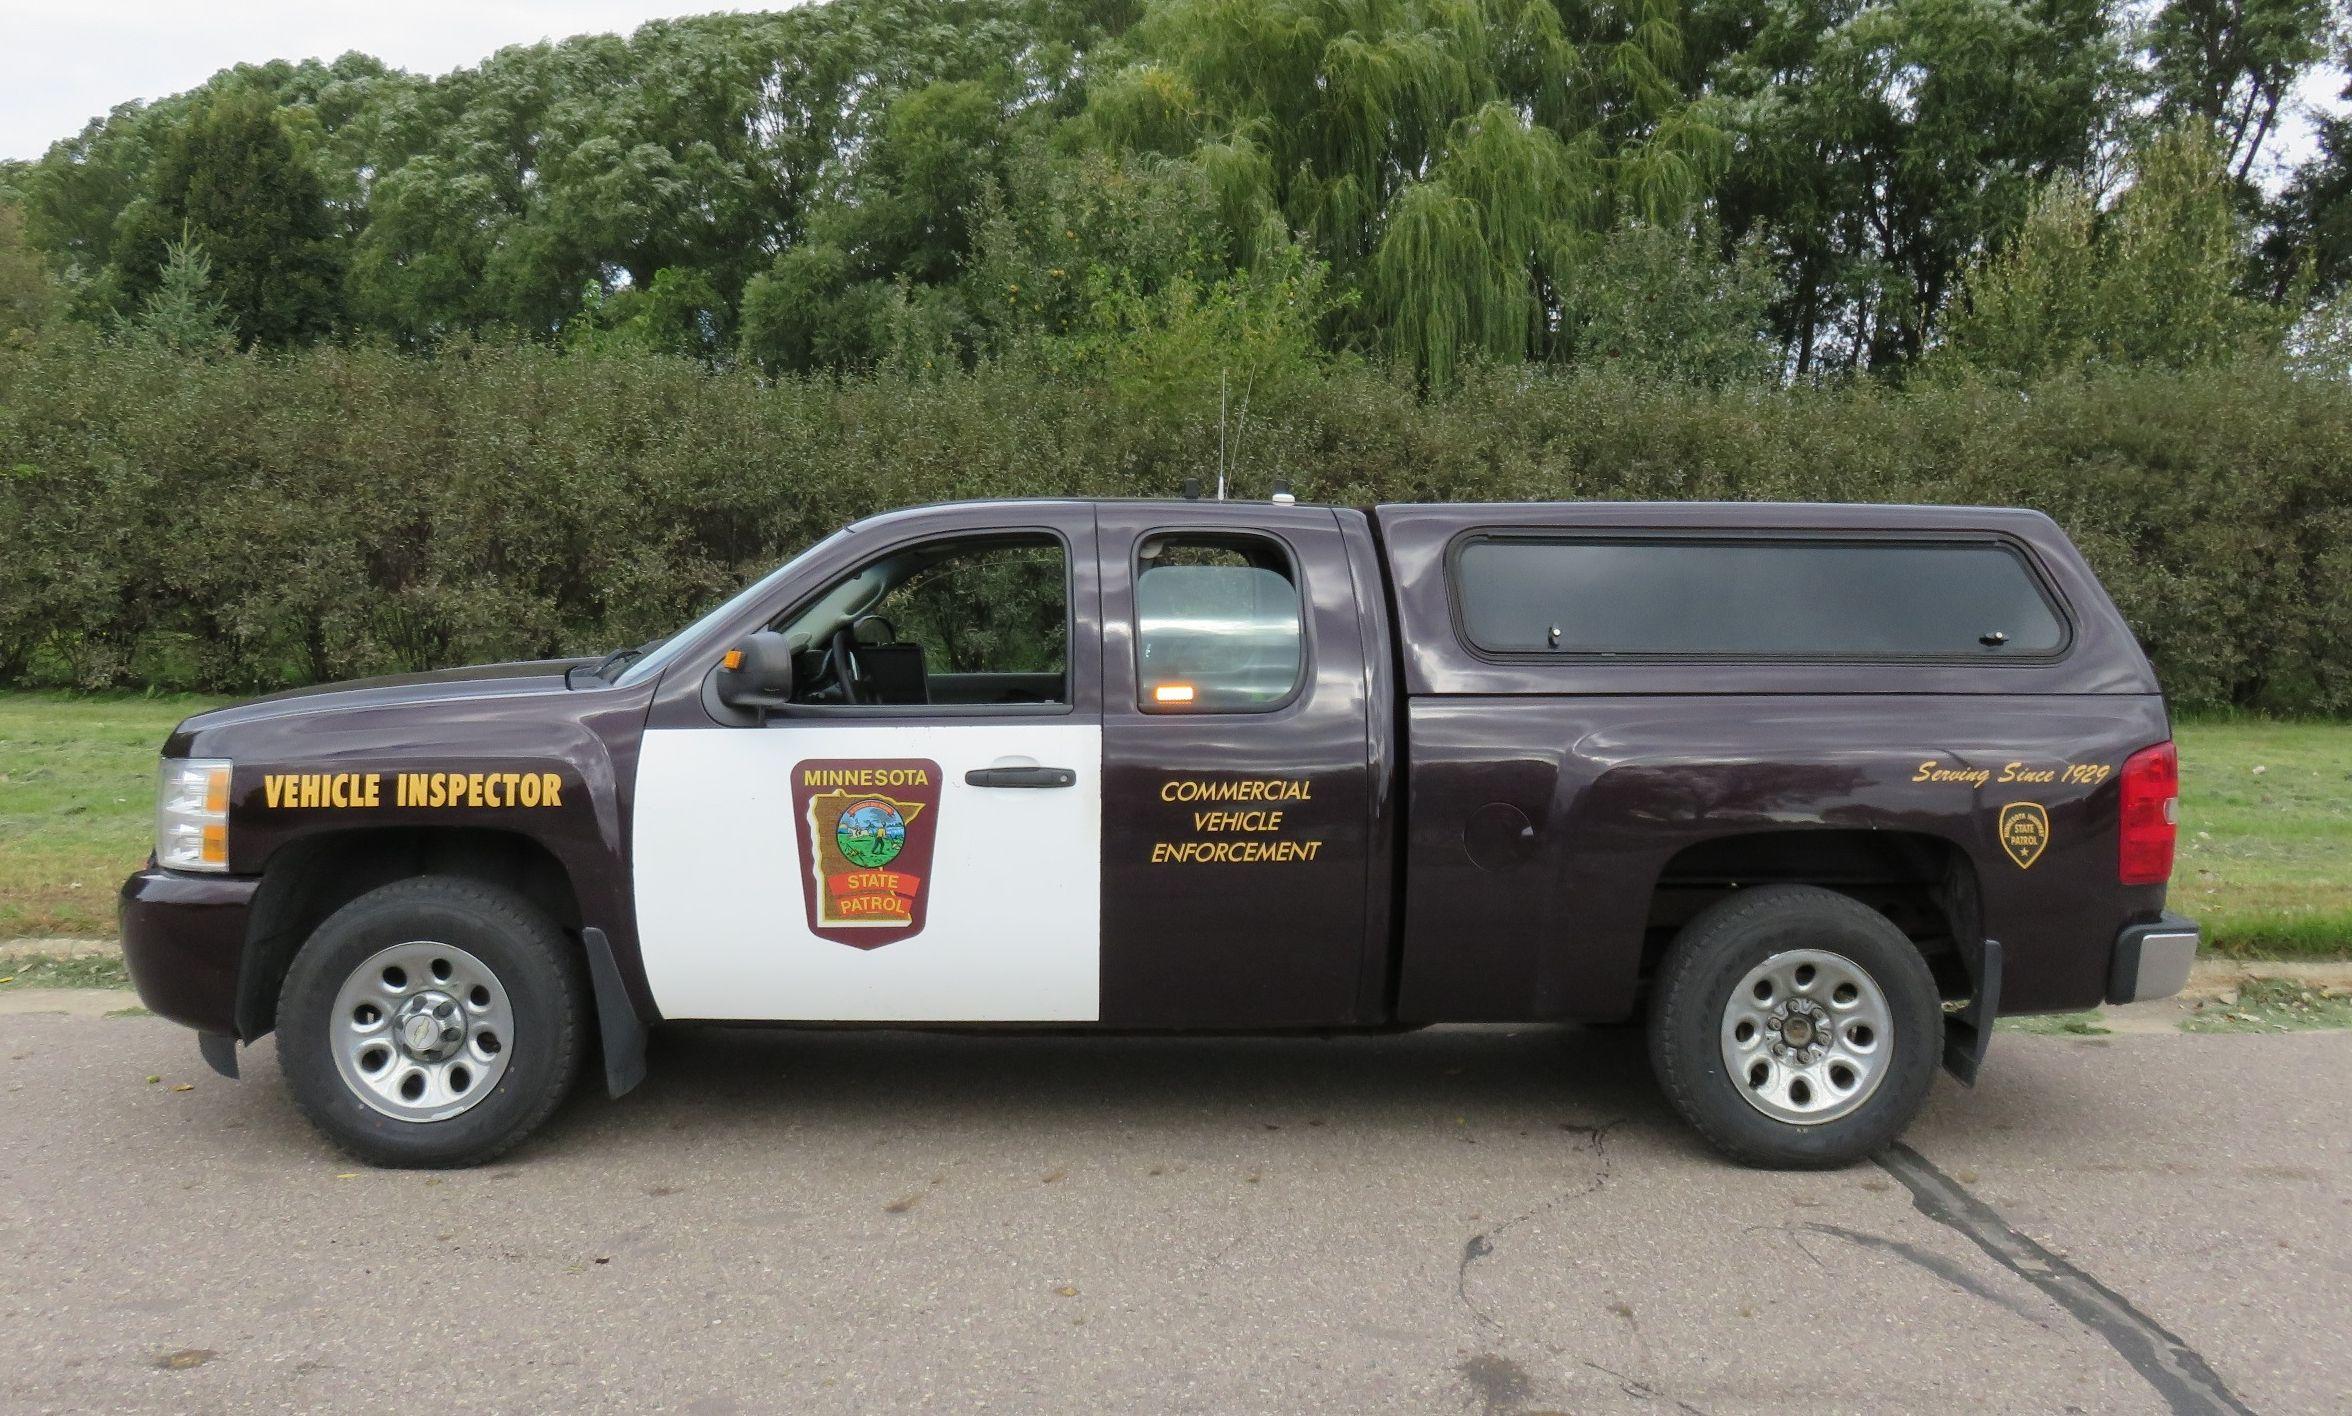 Msp 2014 Chevy Silverado 2014 Chevy Emergency Vehicles State